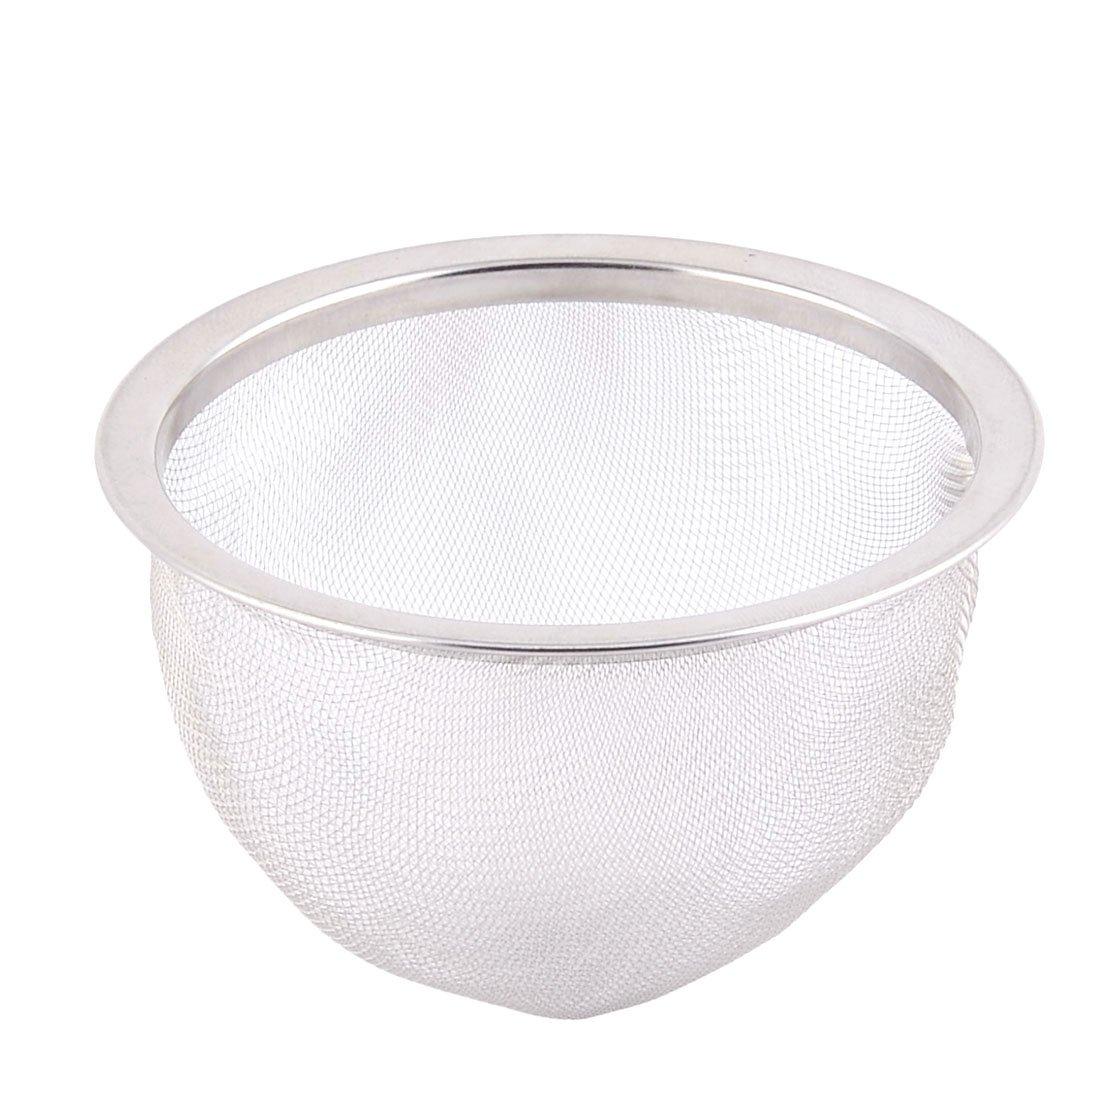 uxcell Stainless Steel Mesh Tea Leaf Spice Teapot Filter Teakettle Strainer 75mm Dia